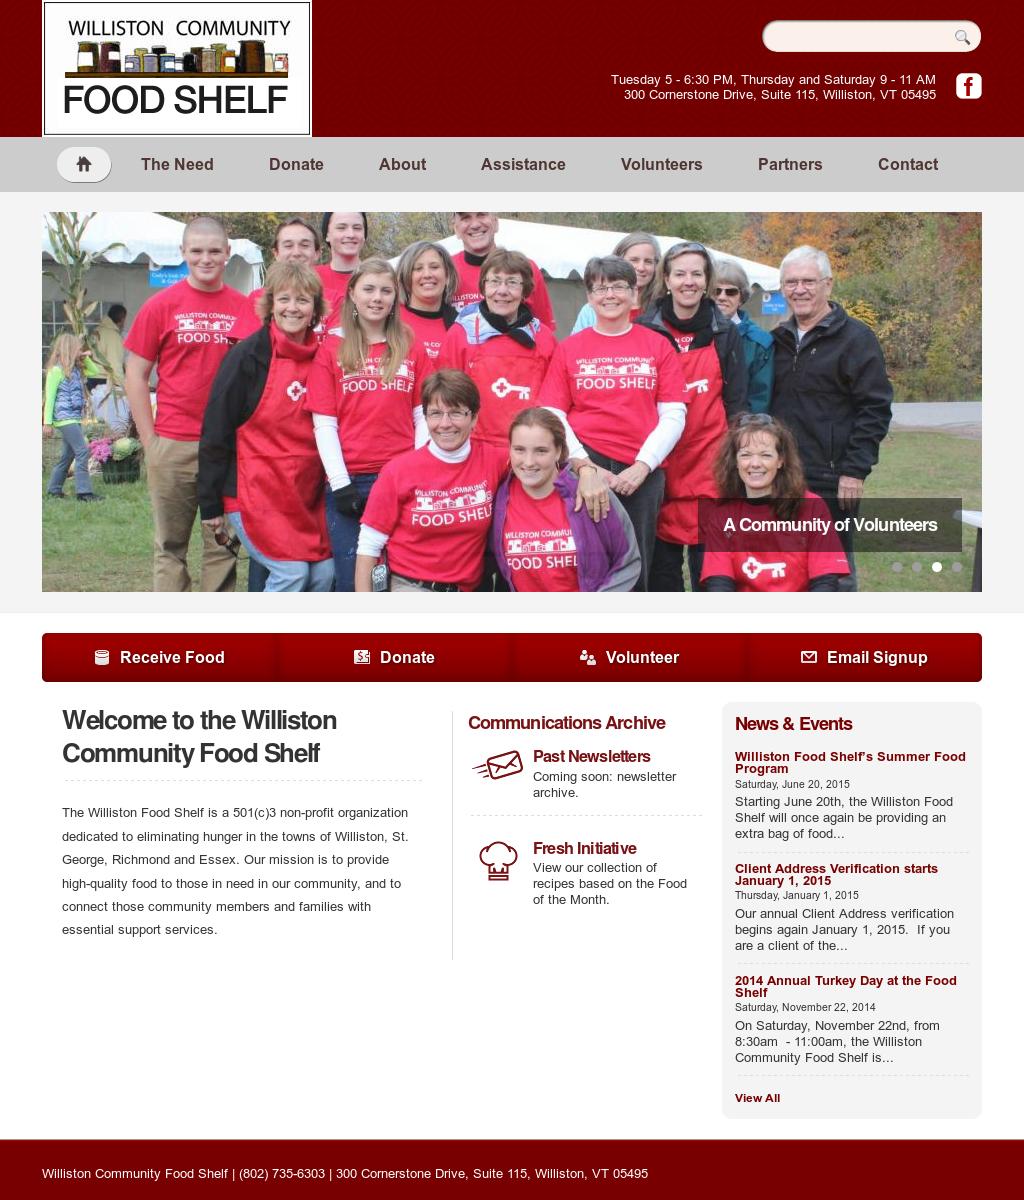 Williston Community Food Shelf Competitors, Revenue and Employees